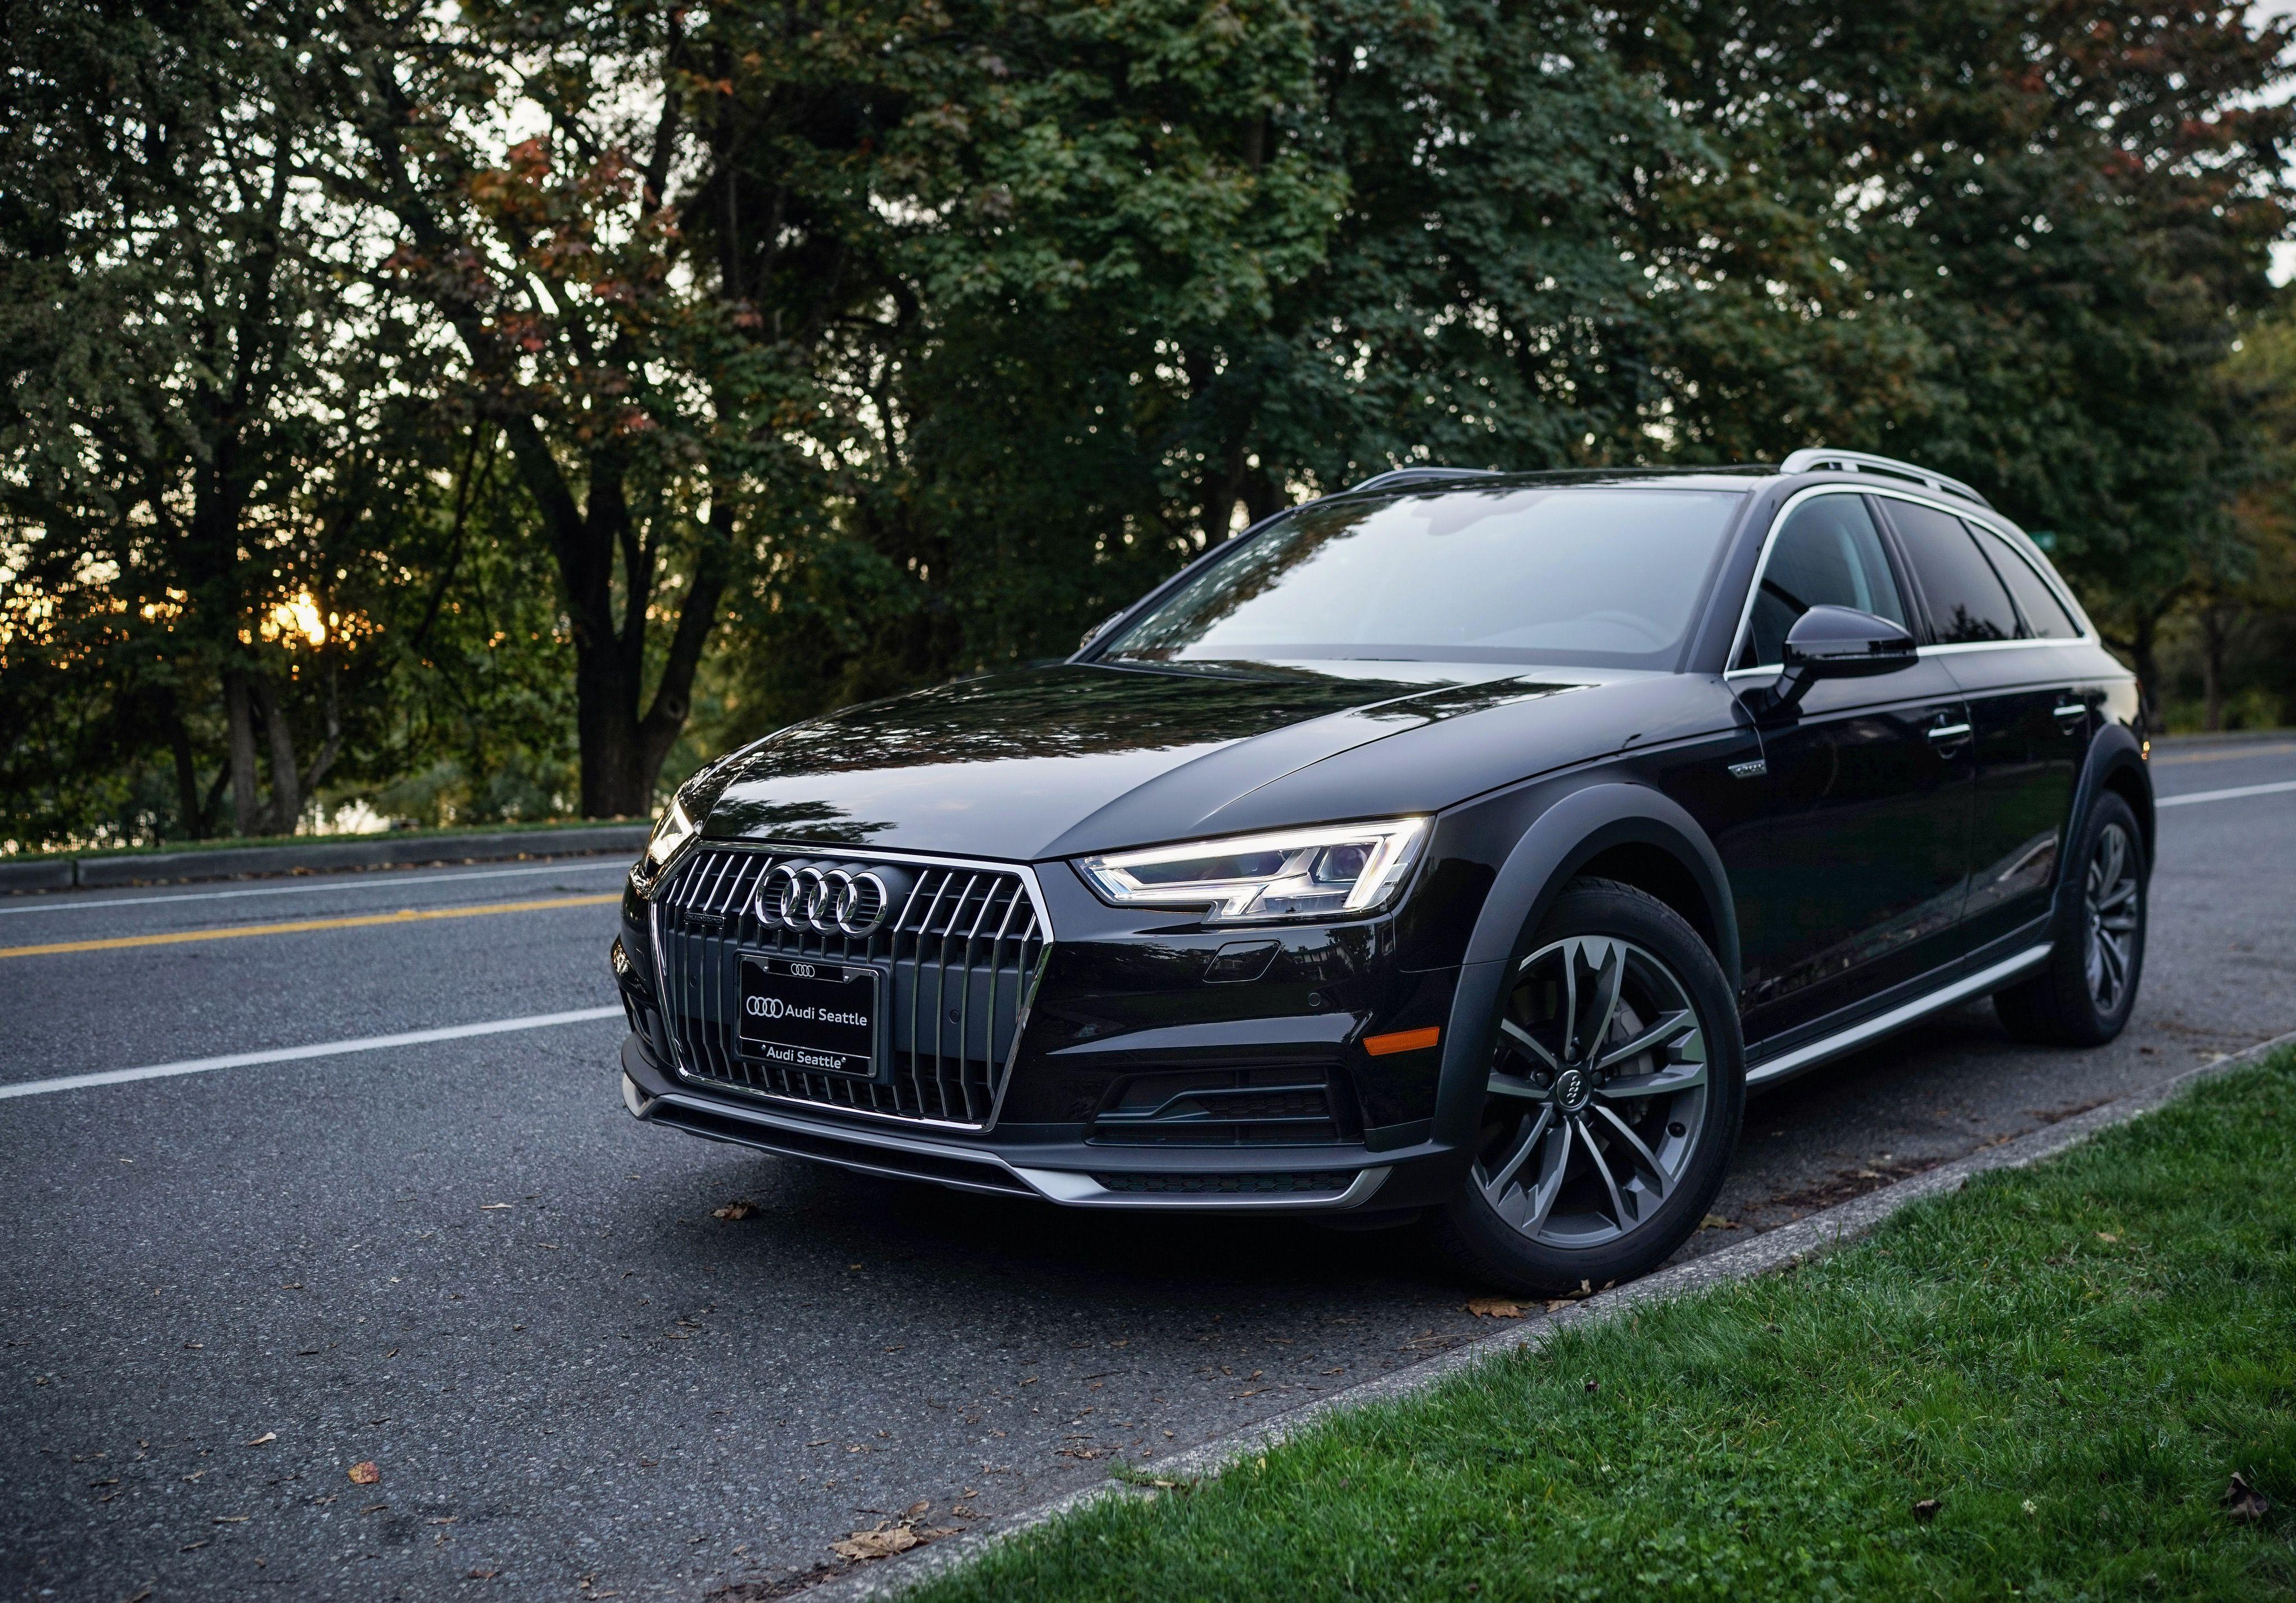 2017 Brilliant Black Allroad Audi Seattle Green Lake